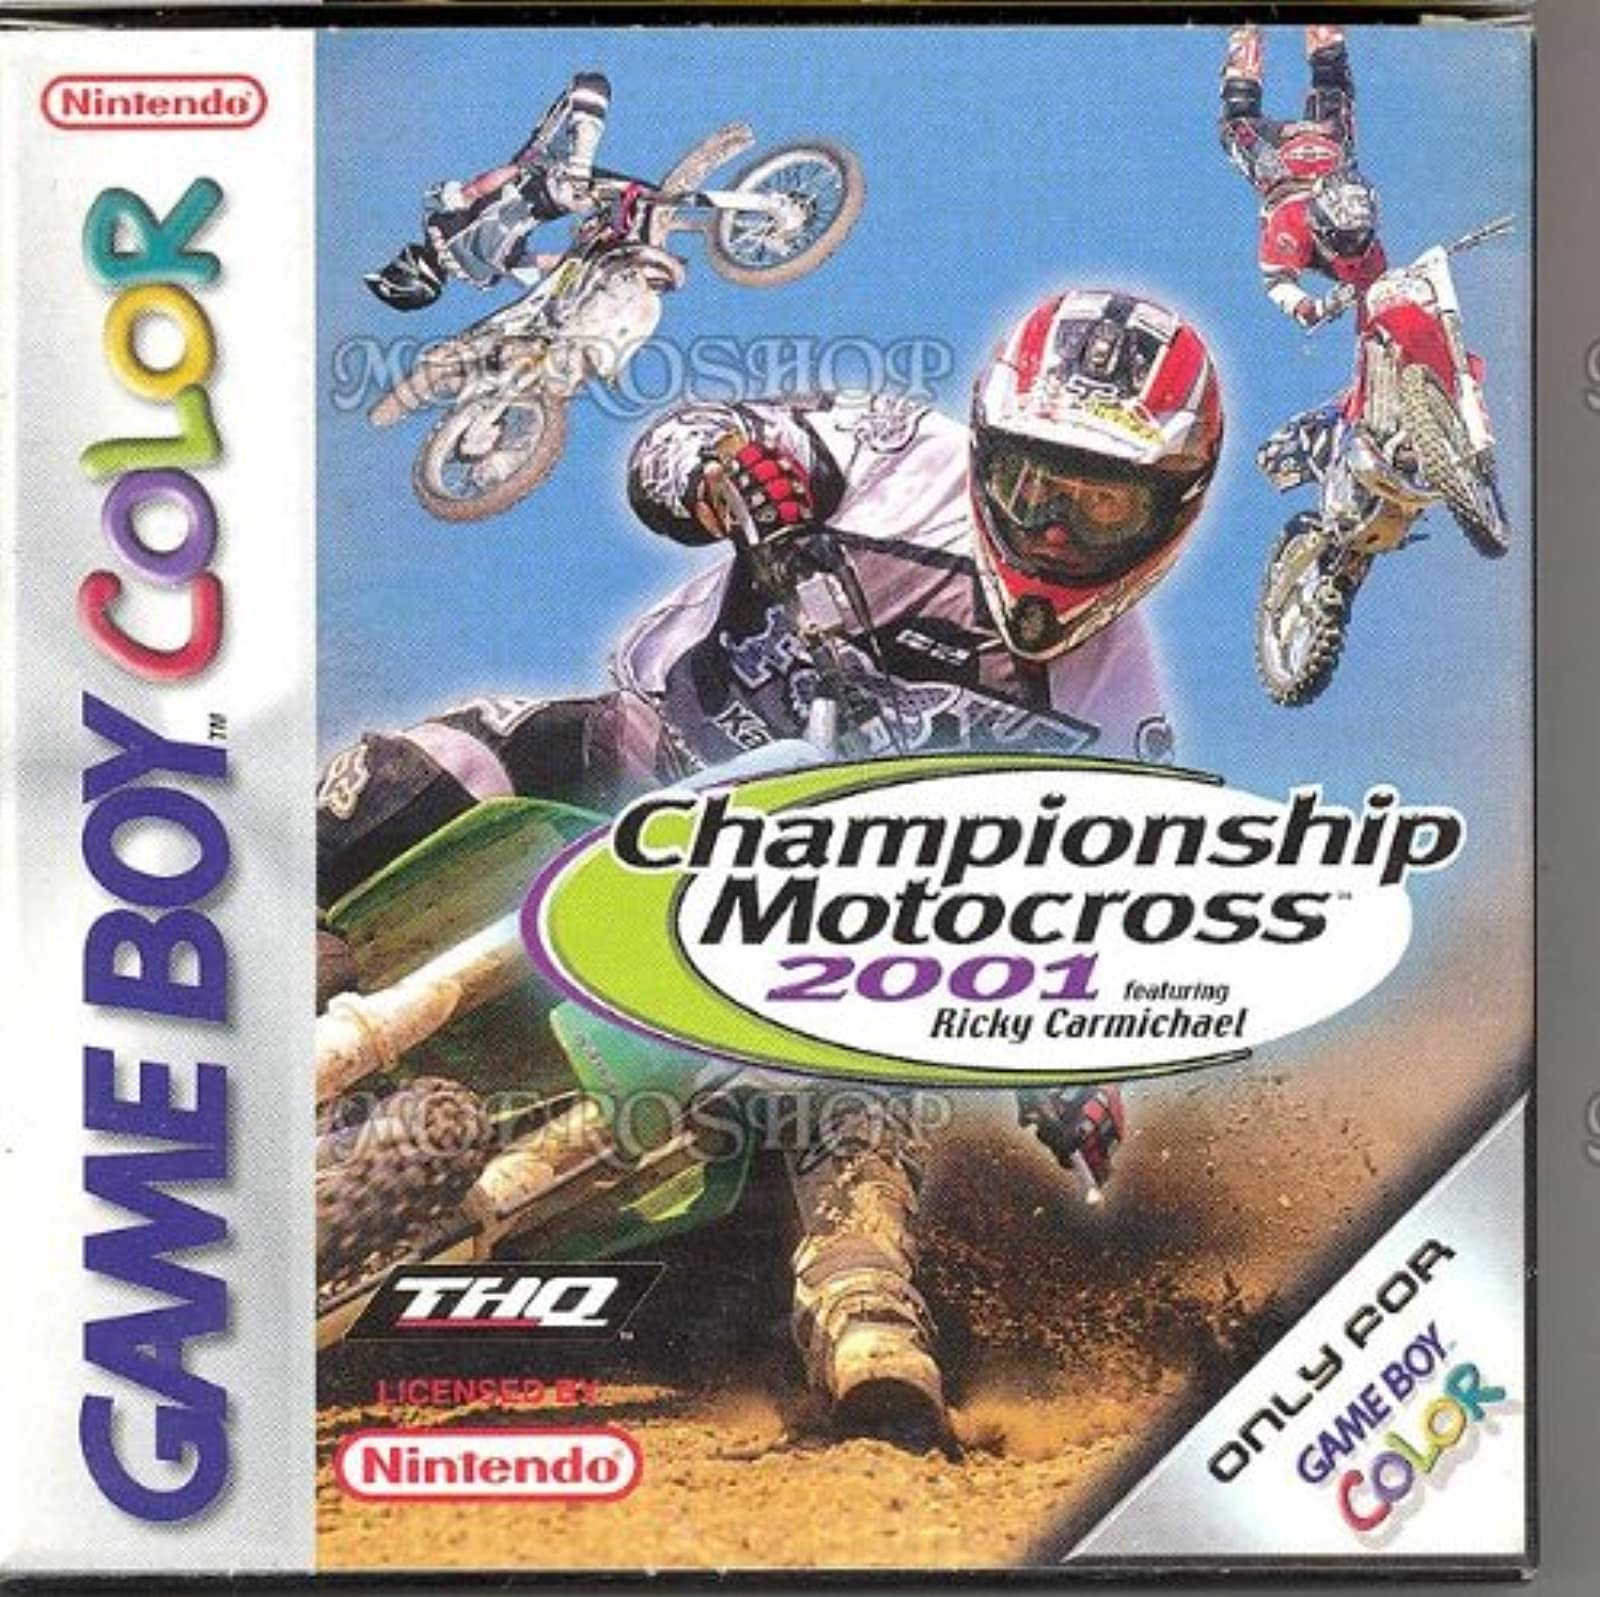 Championship Motocross 2001 GBC On Gameboy Color